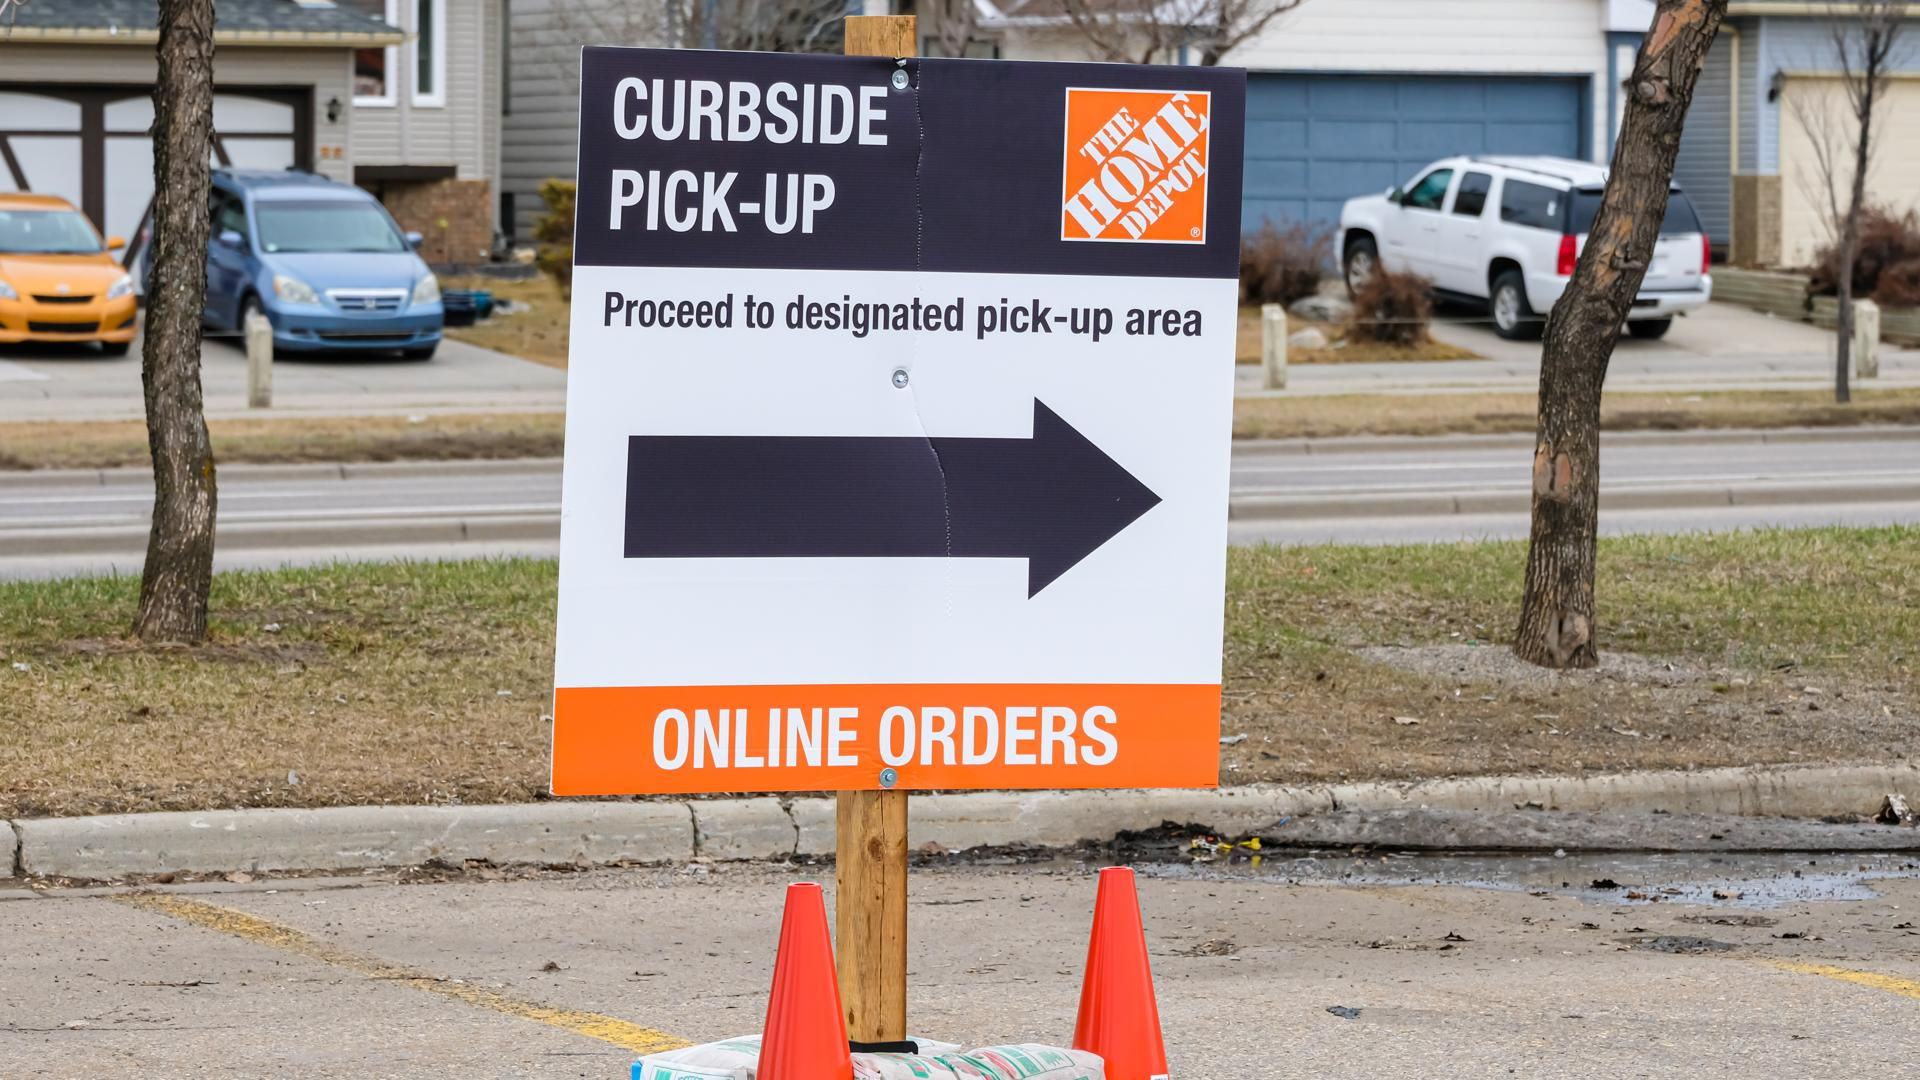 April 25 2020 - Calgary, Alberta Canada - directing cutomers for curbside pickup covid-19 corona virus pandemic.